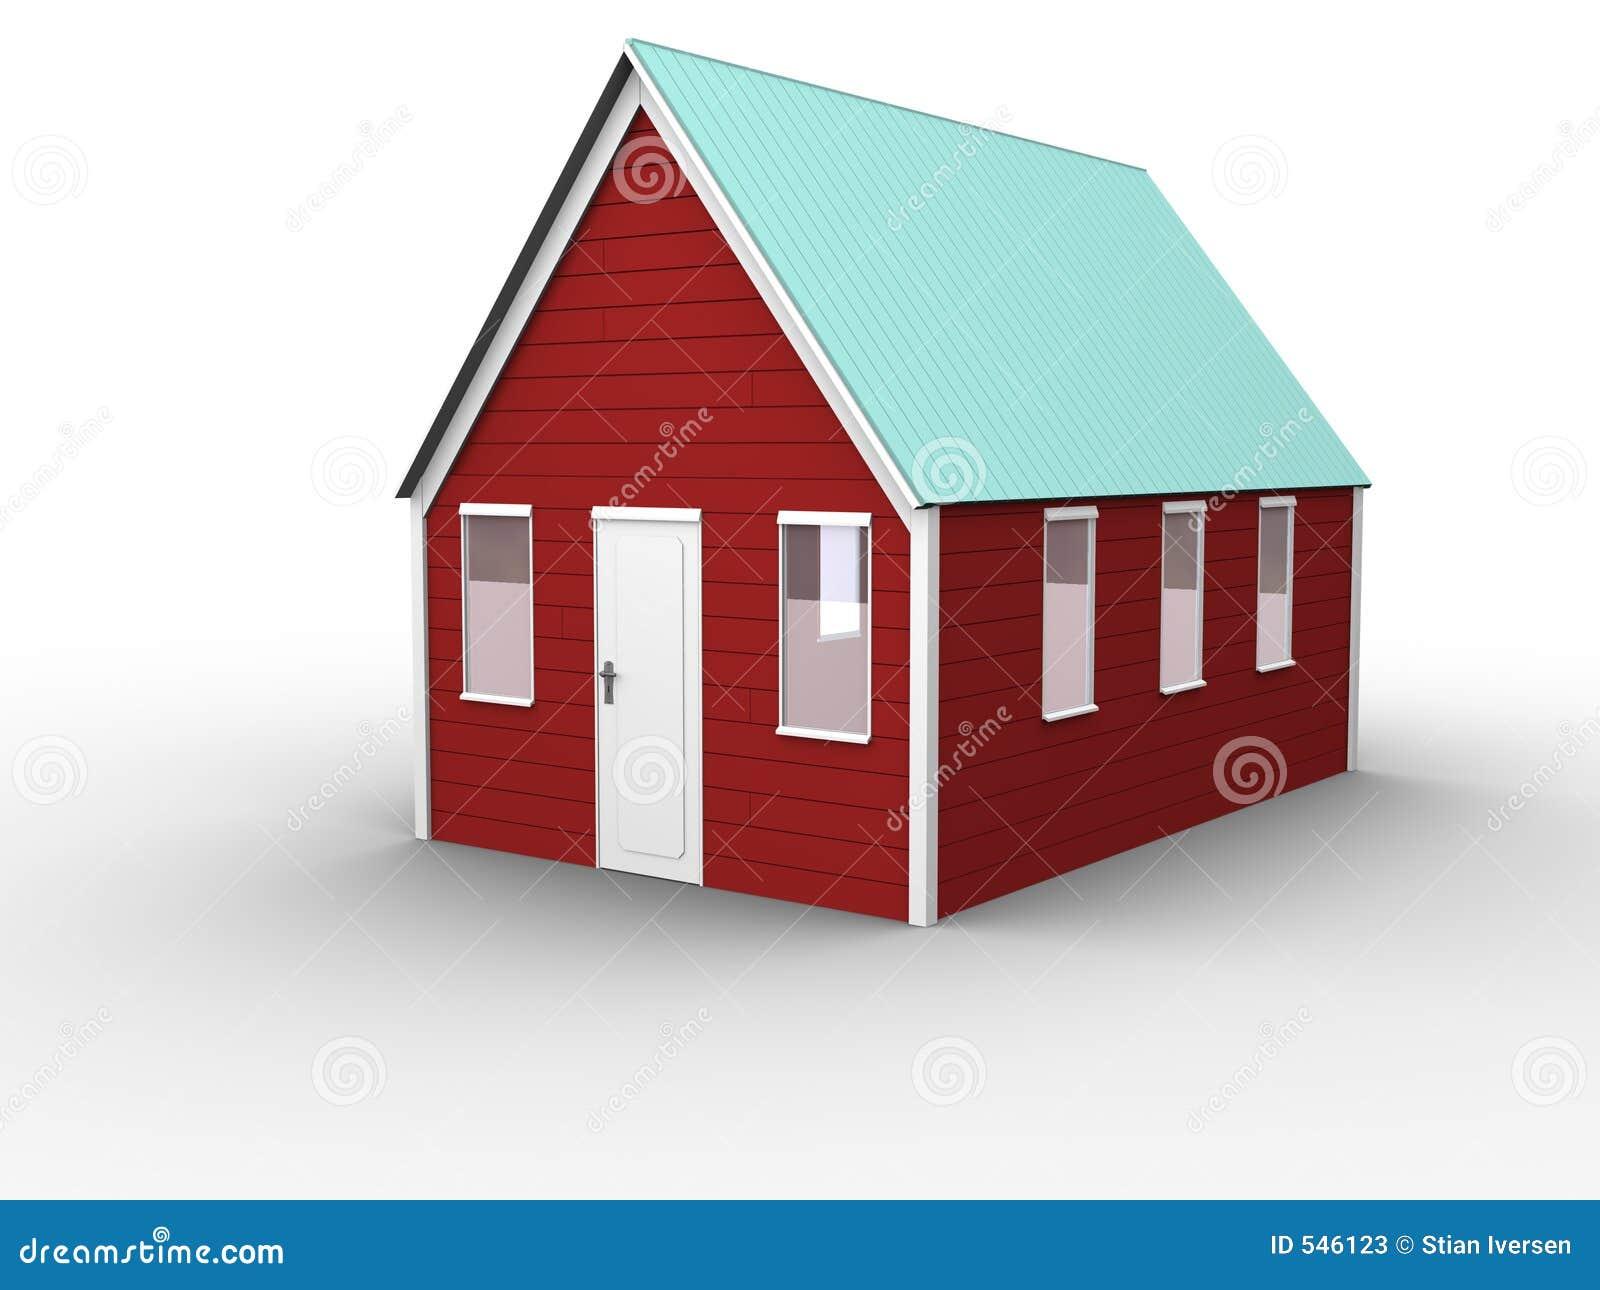 Download 02个房子红色 库存例证. 插画 包括有 建筑师, 红色, 计算机, 屋顶, 村庄, 玻璃, 木匠, 自定义 - 546123